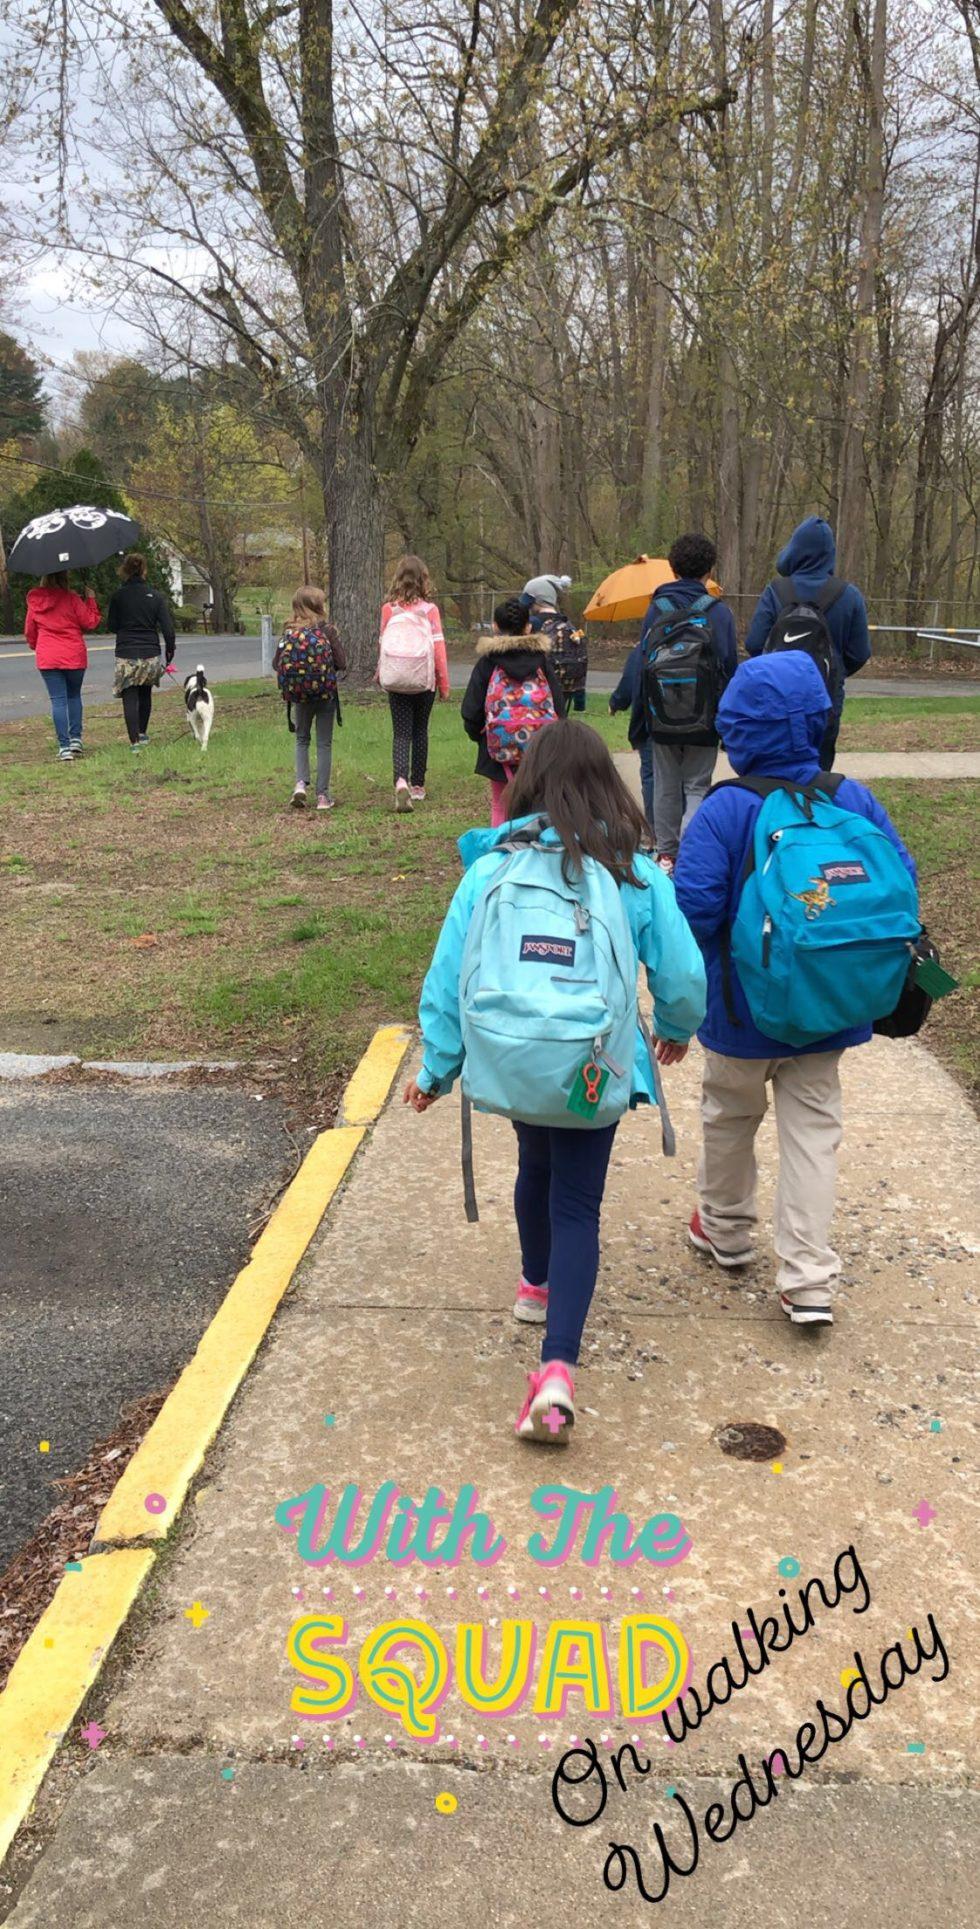 Principal Madden's Weekly Update—Week of May 6